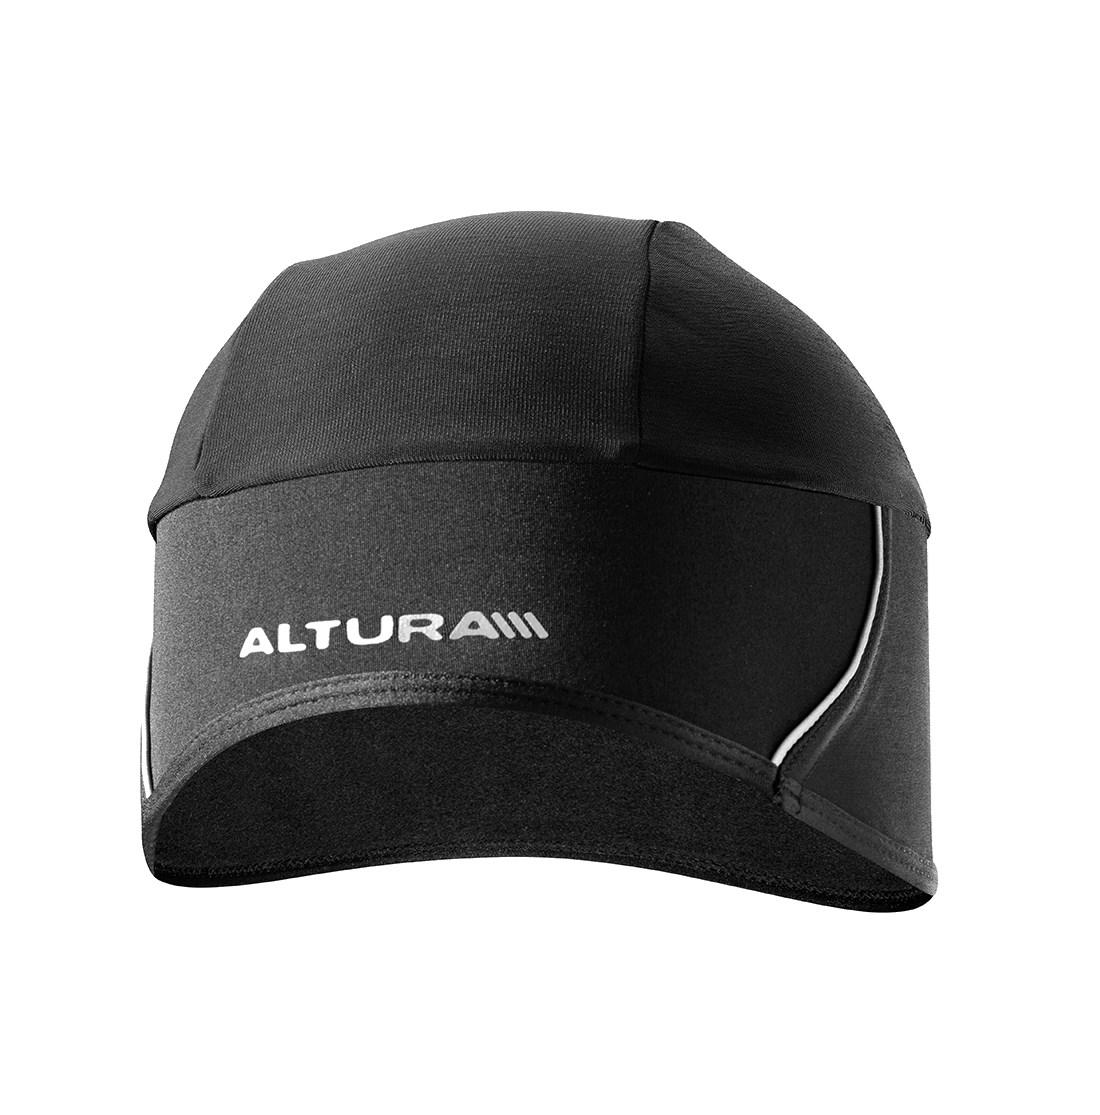 http://www.leisurelakesbikes.com/images/altura-windproof-skull-cap.jpeg?maxheight=1200